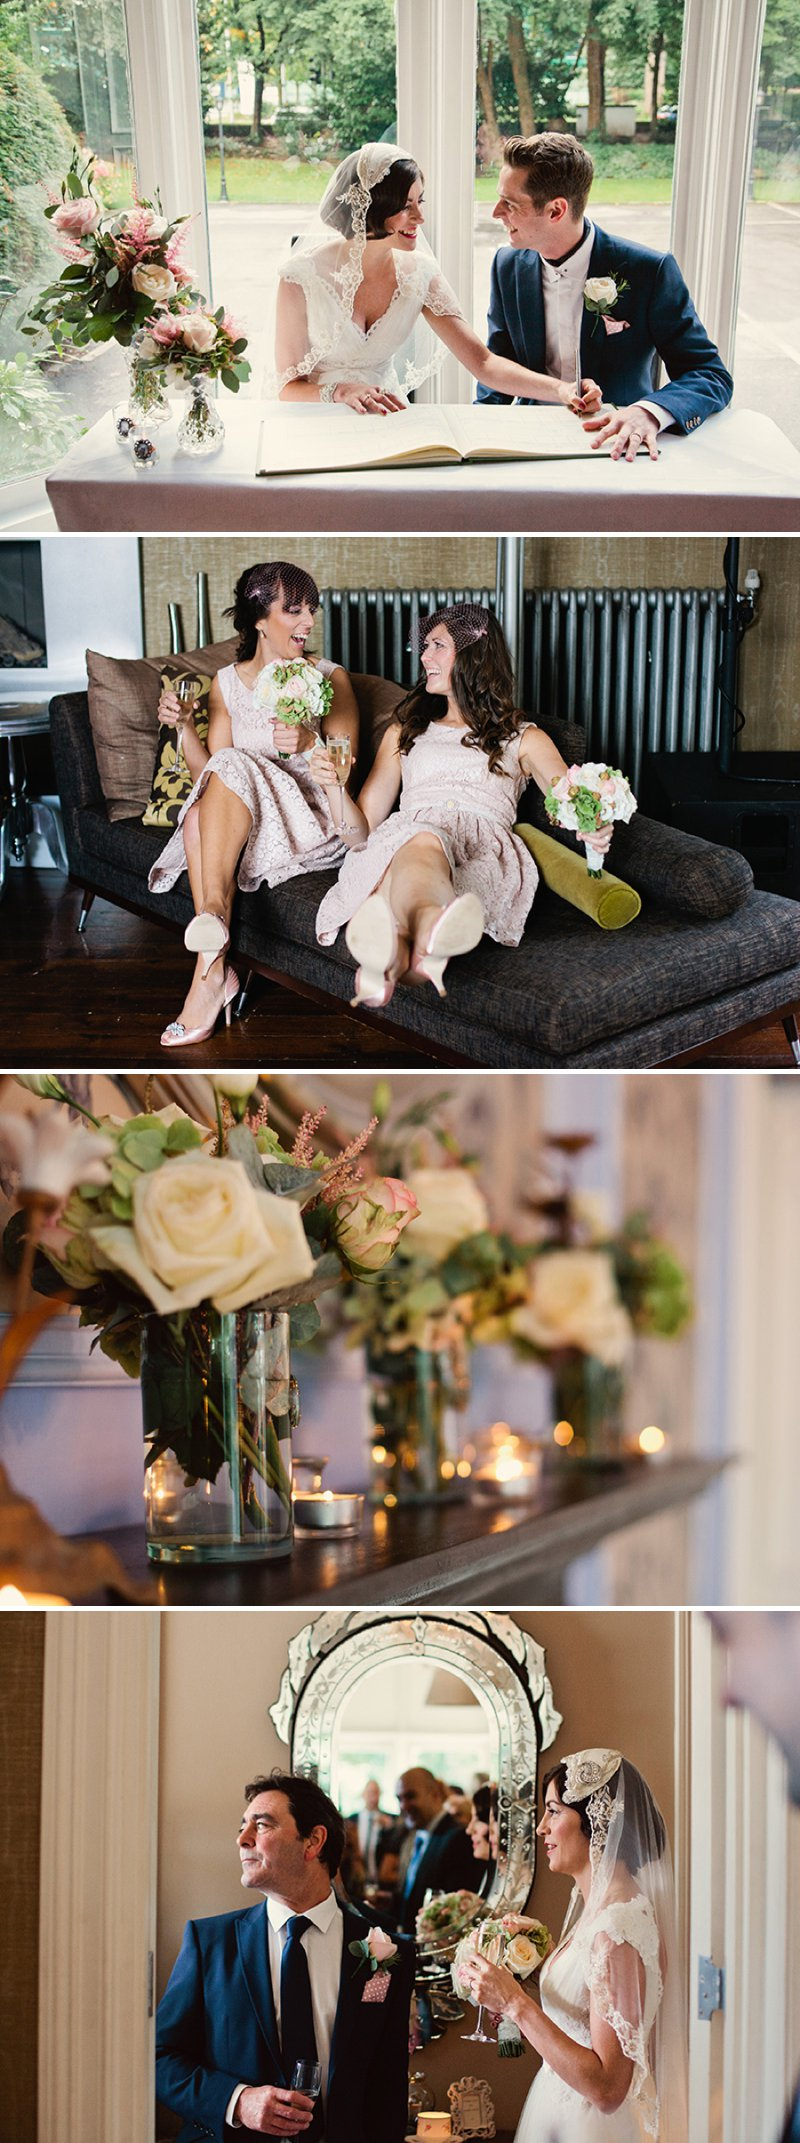 Antique Vintage Bridal Veil Cap Pink Bridesmaid Dress